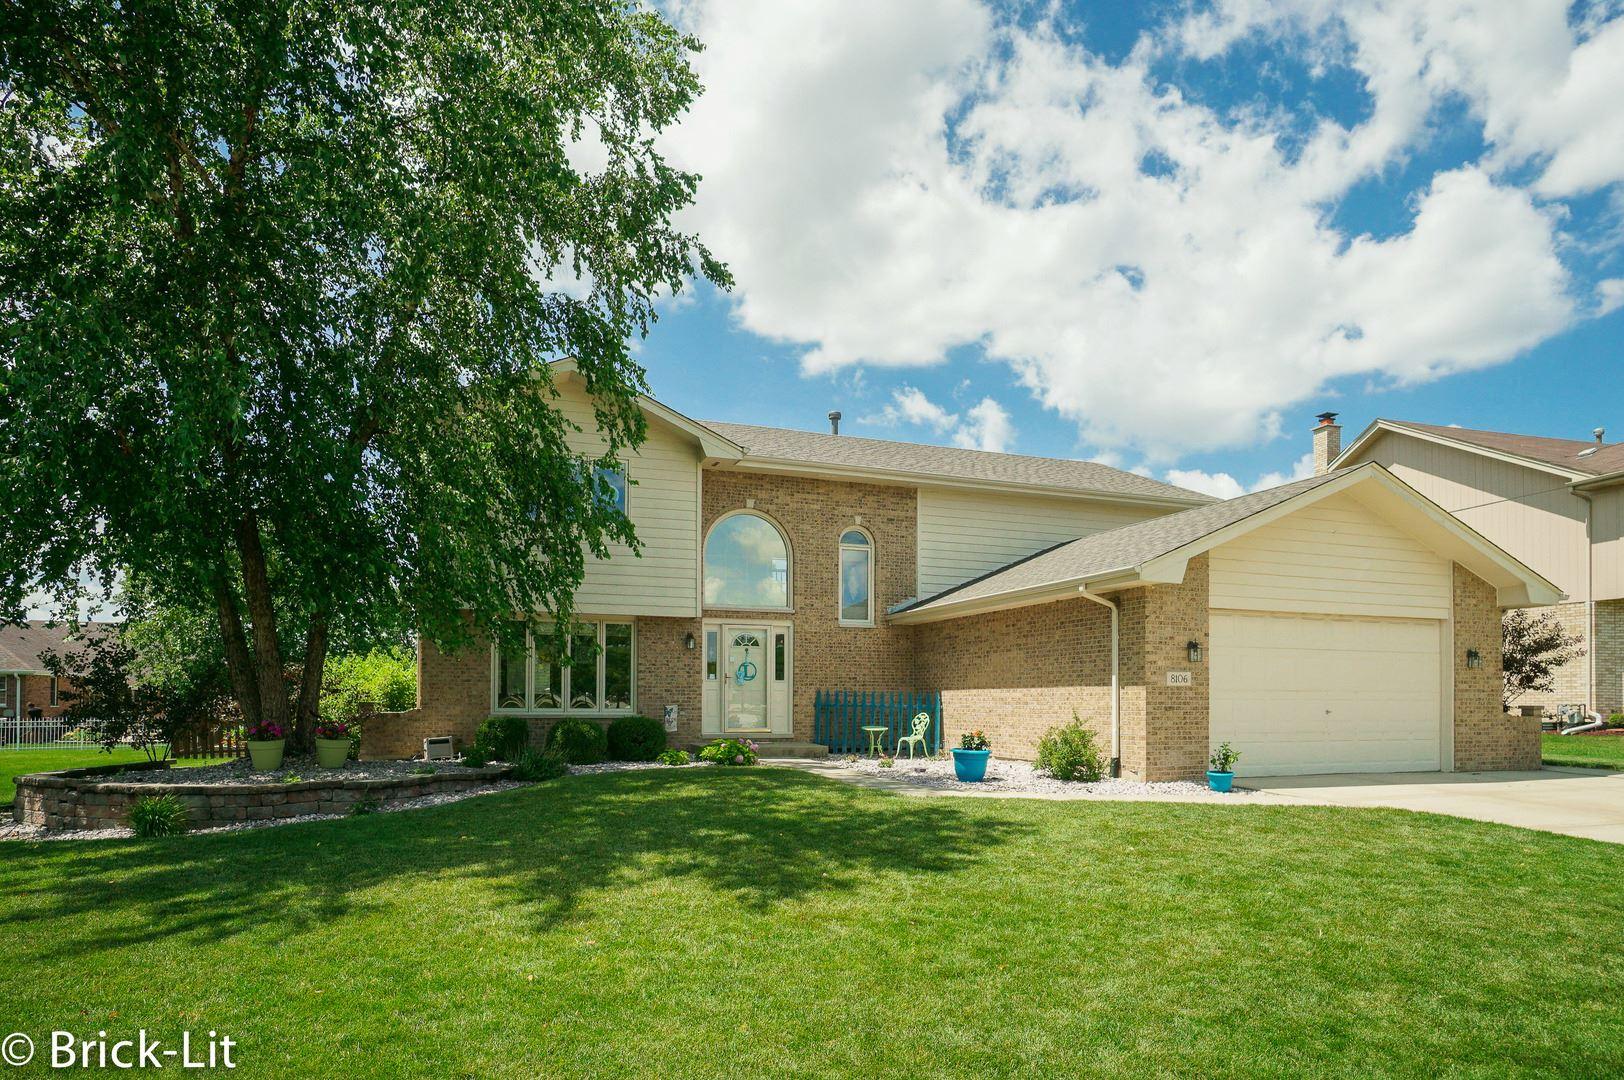 8106 Brookside Glen Drive, Tinley Park, IL 60487 - #: 10779931